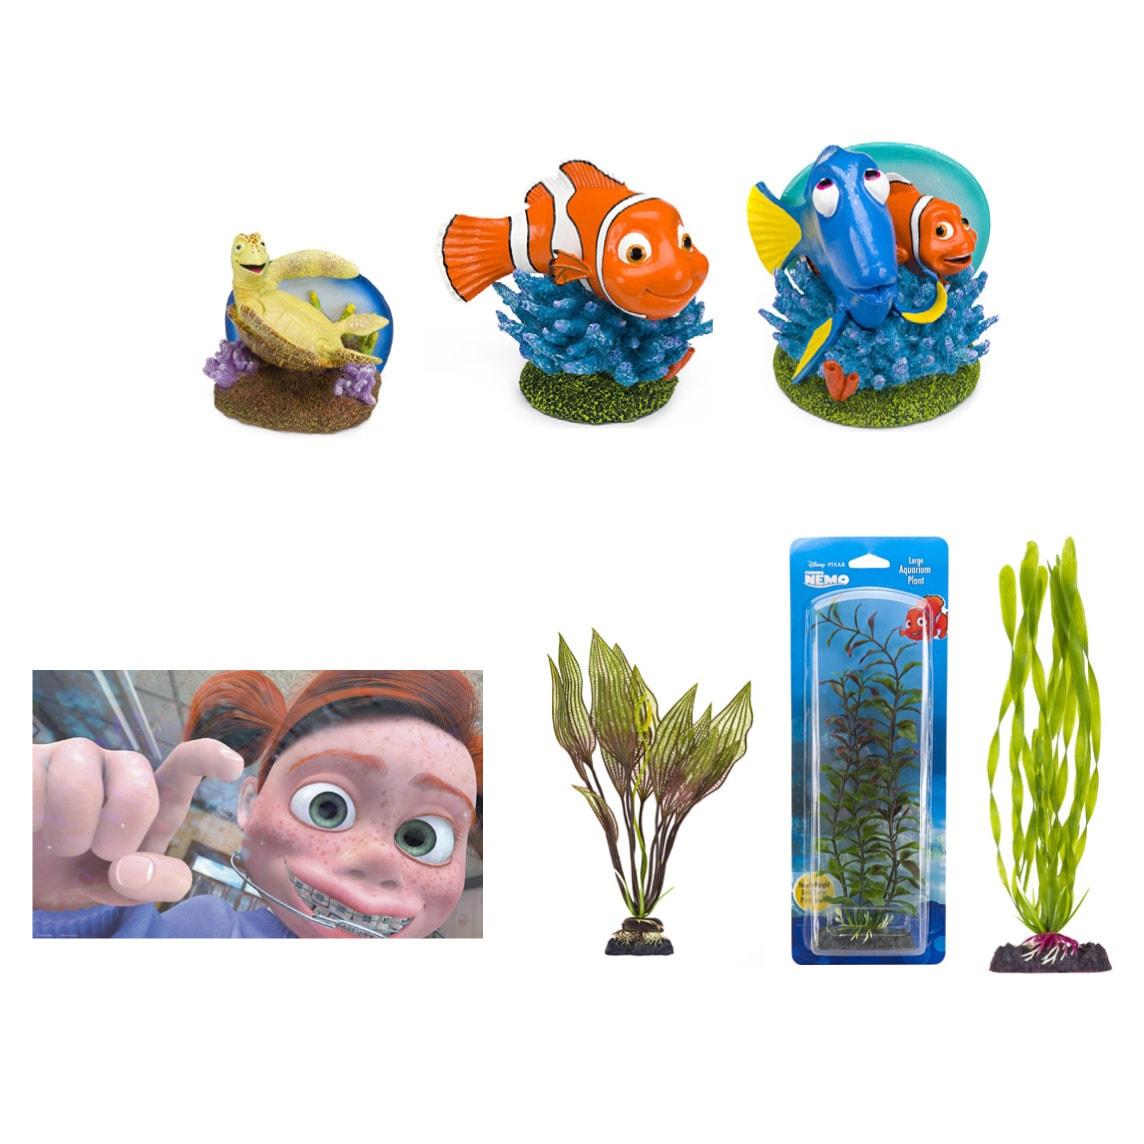 Penn Plax Disney Pixar Finding Nemo Aquarium Decoration K...